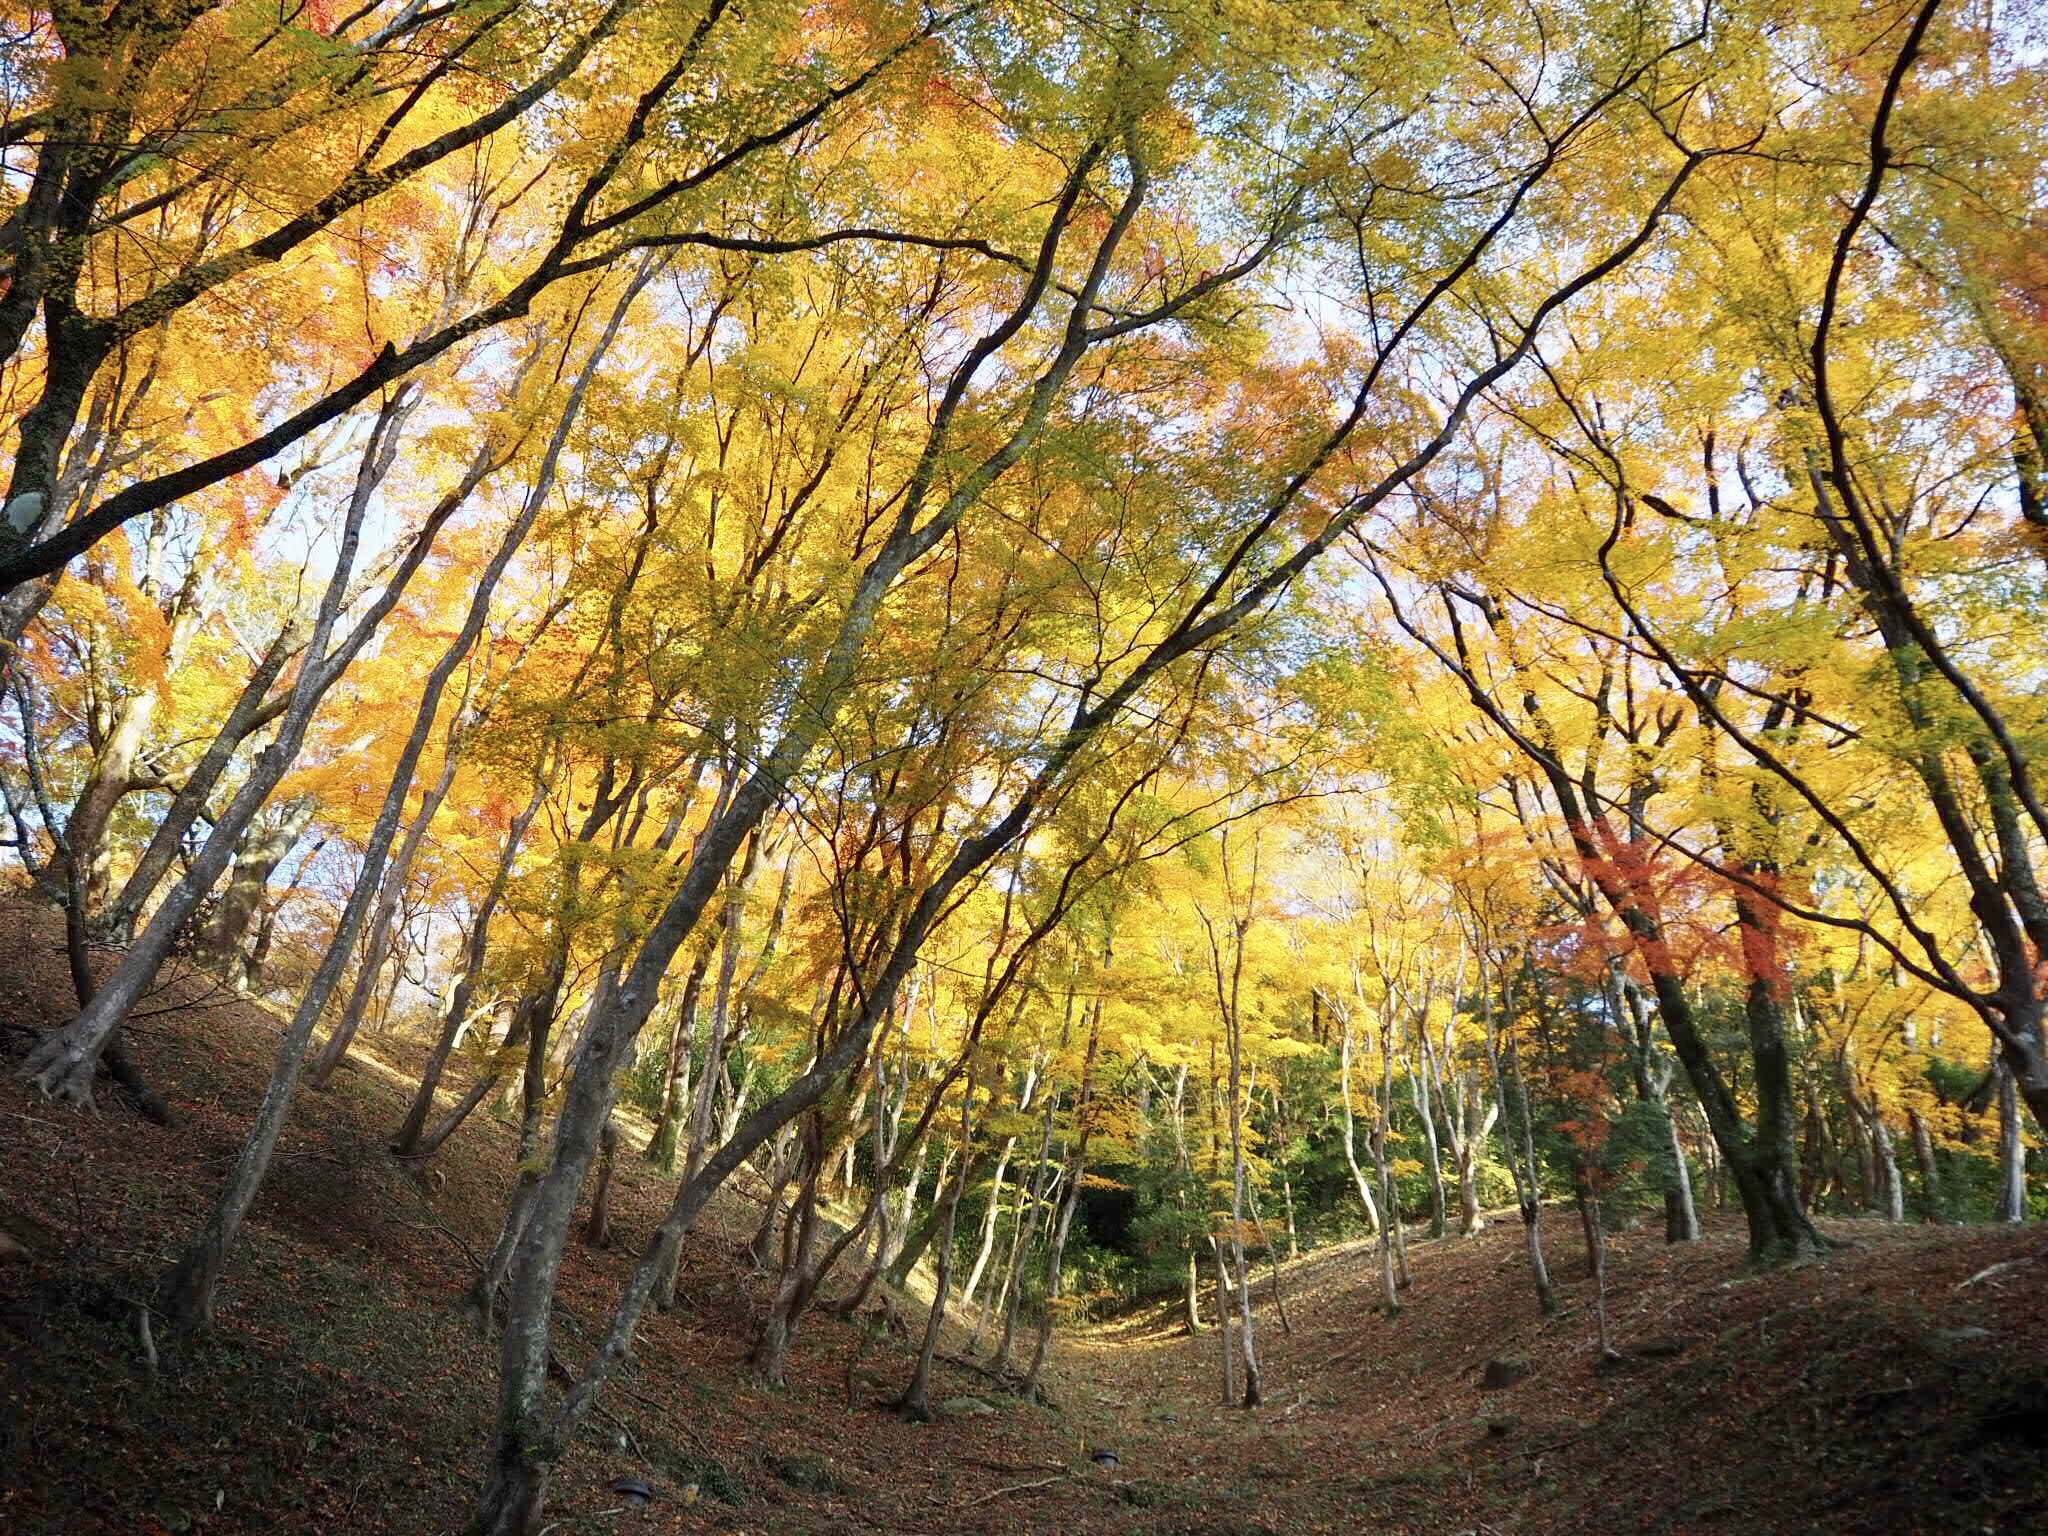 img 7477 - 香嵐渓 - 日本の秋を感じる 愛知県豊田市の紅葉スポット